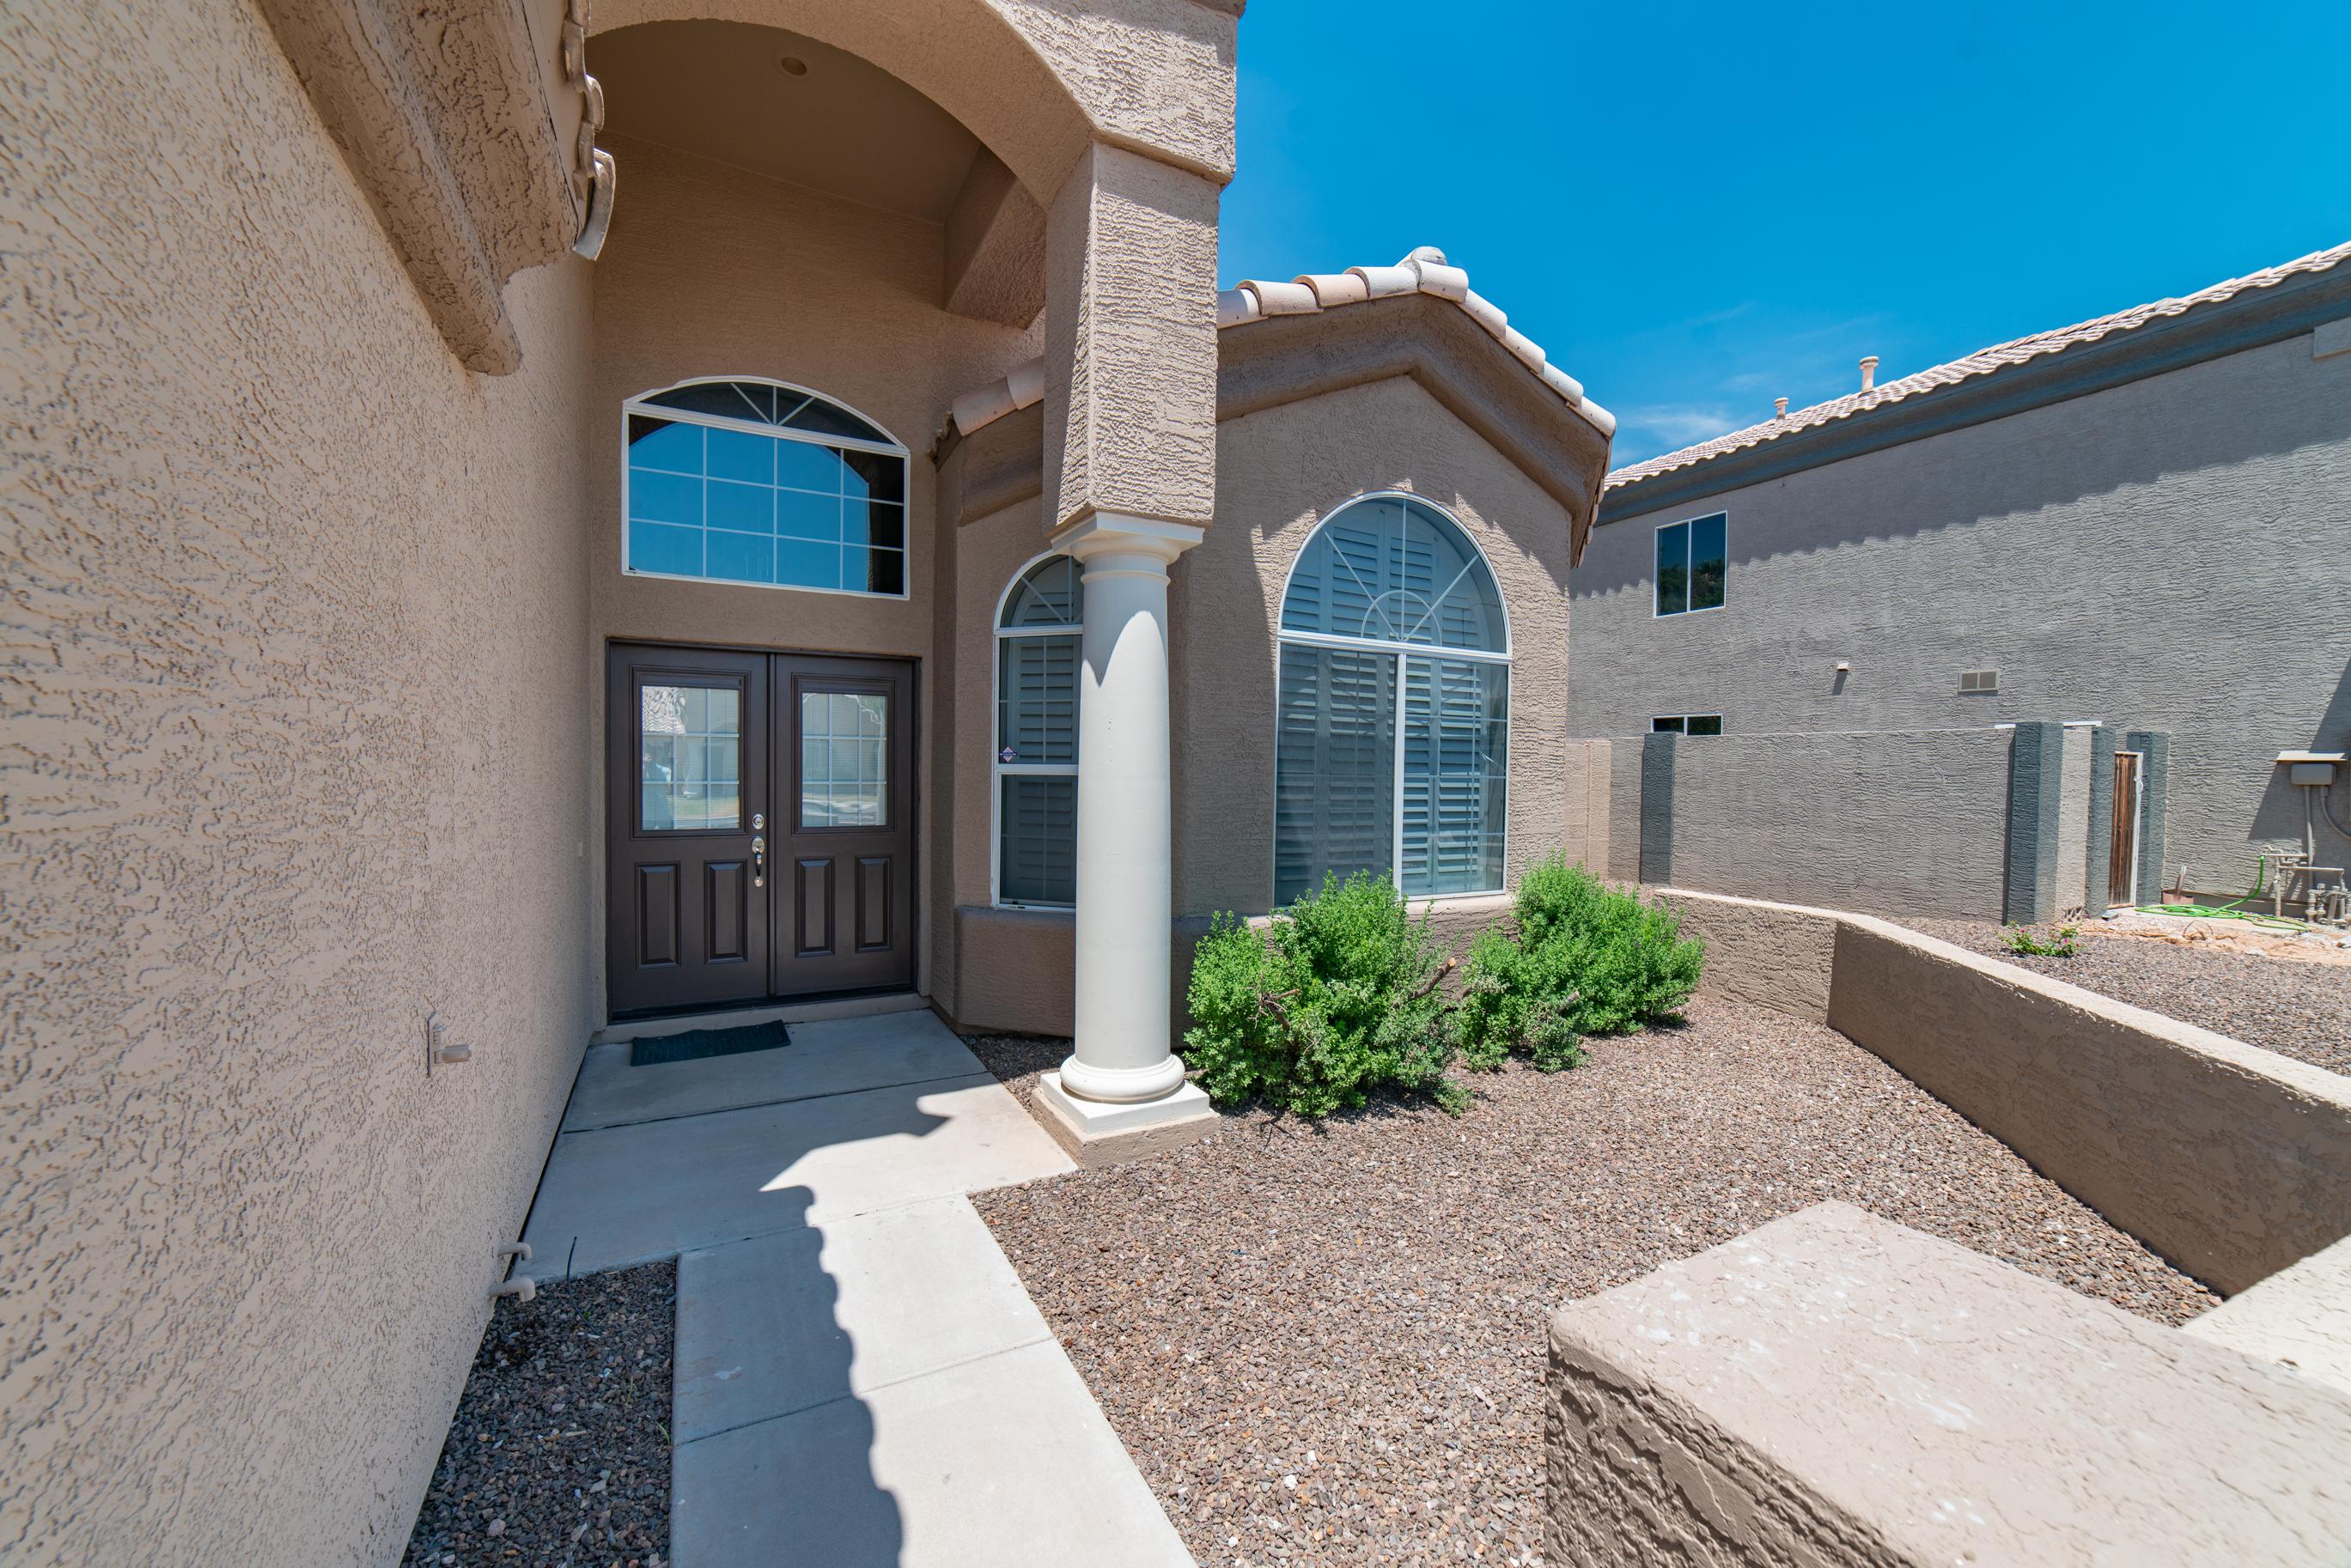 5 Bed 3 Bath Mesa, AZ High Quality Remodel Home